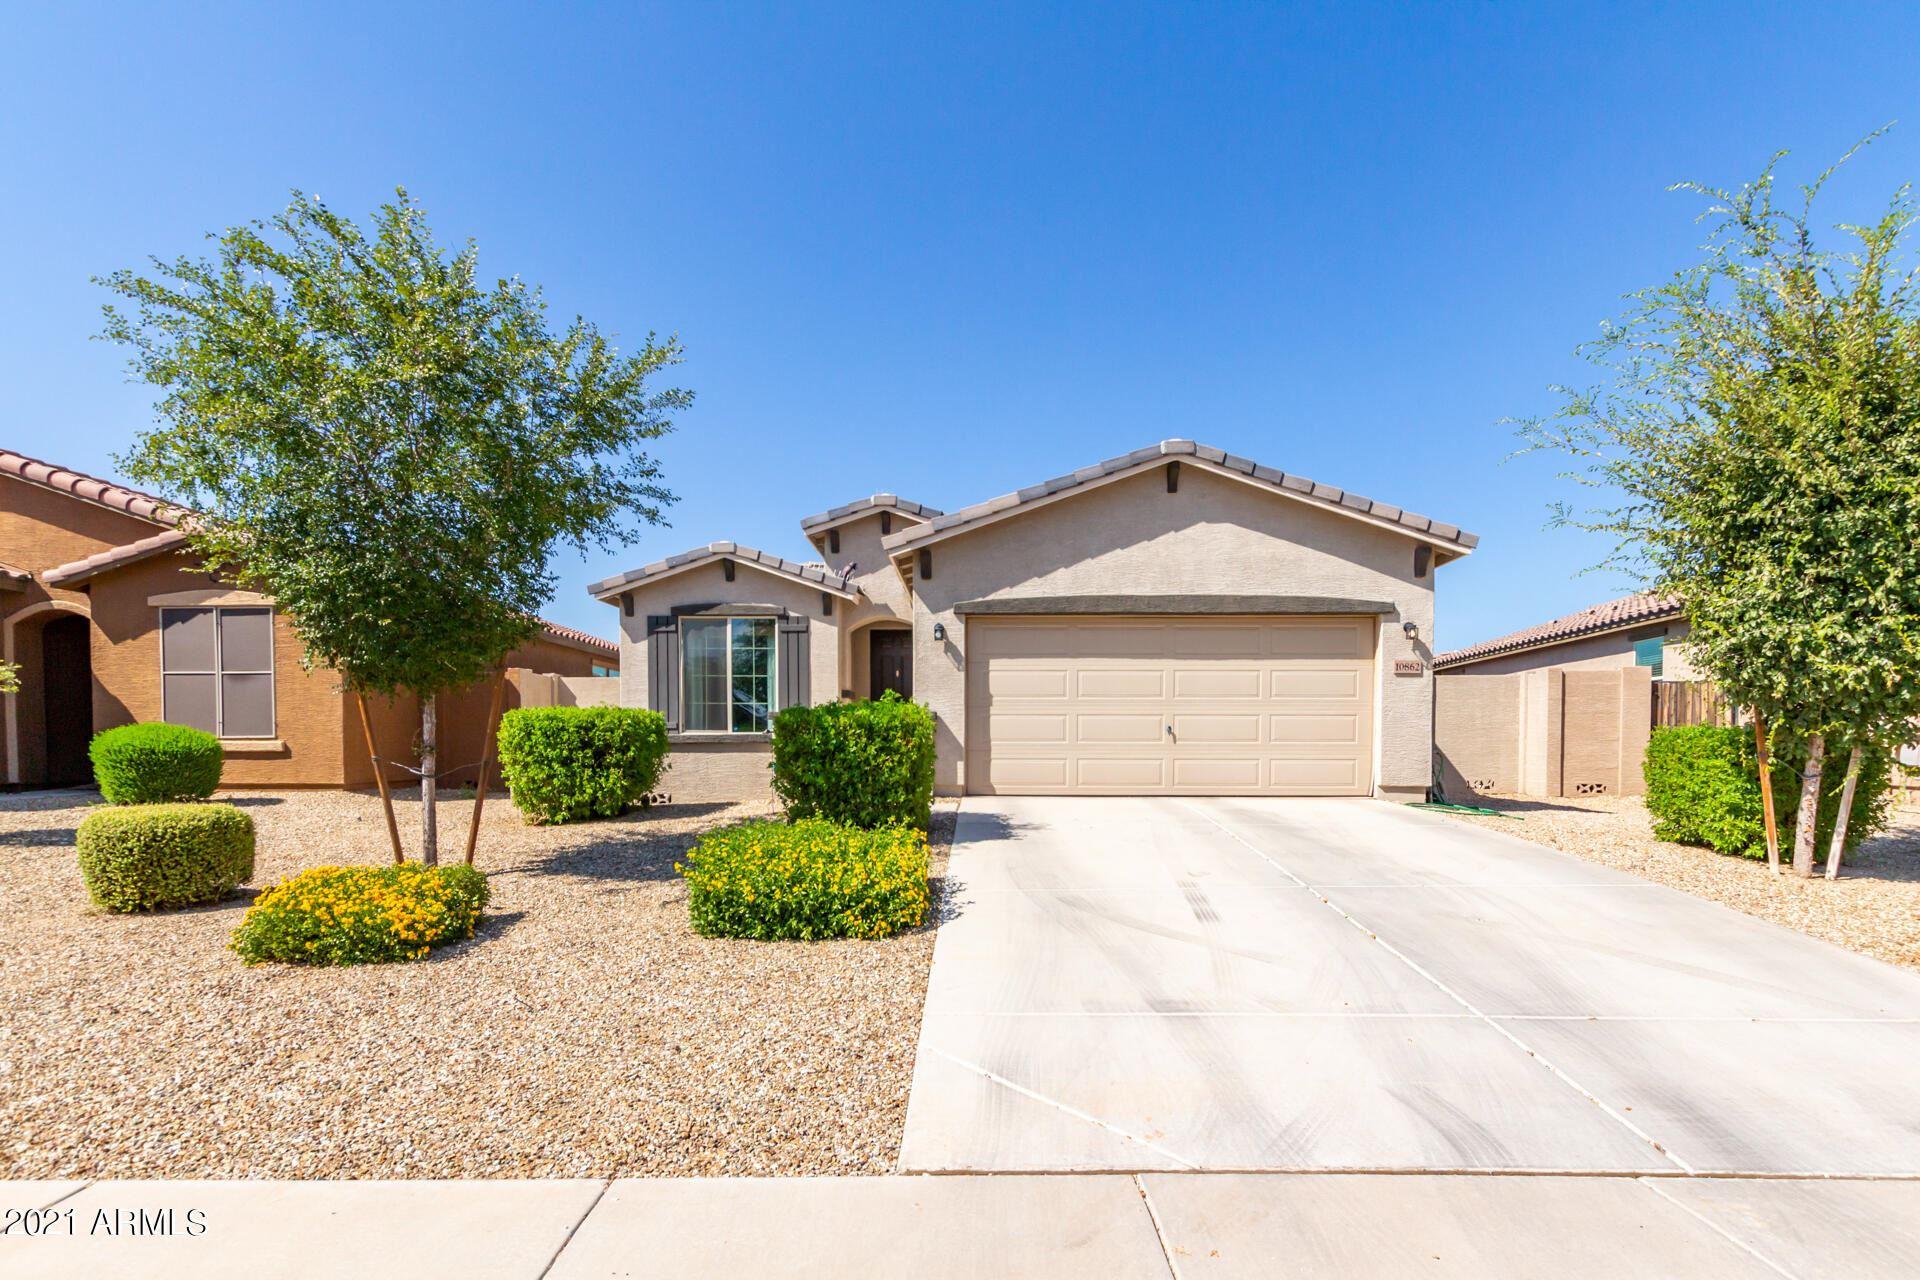 Photo of 10862 W WOODLAND Avenue, Avondale, AZ 85323 (MLS # 6306720)